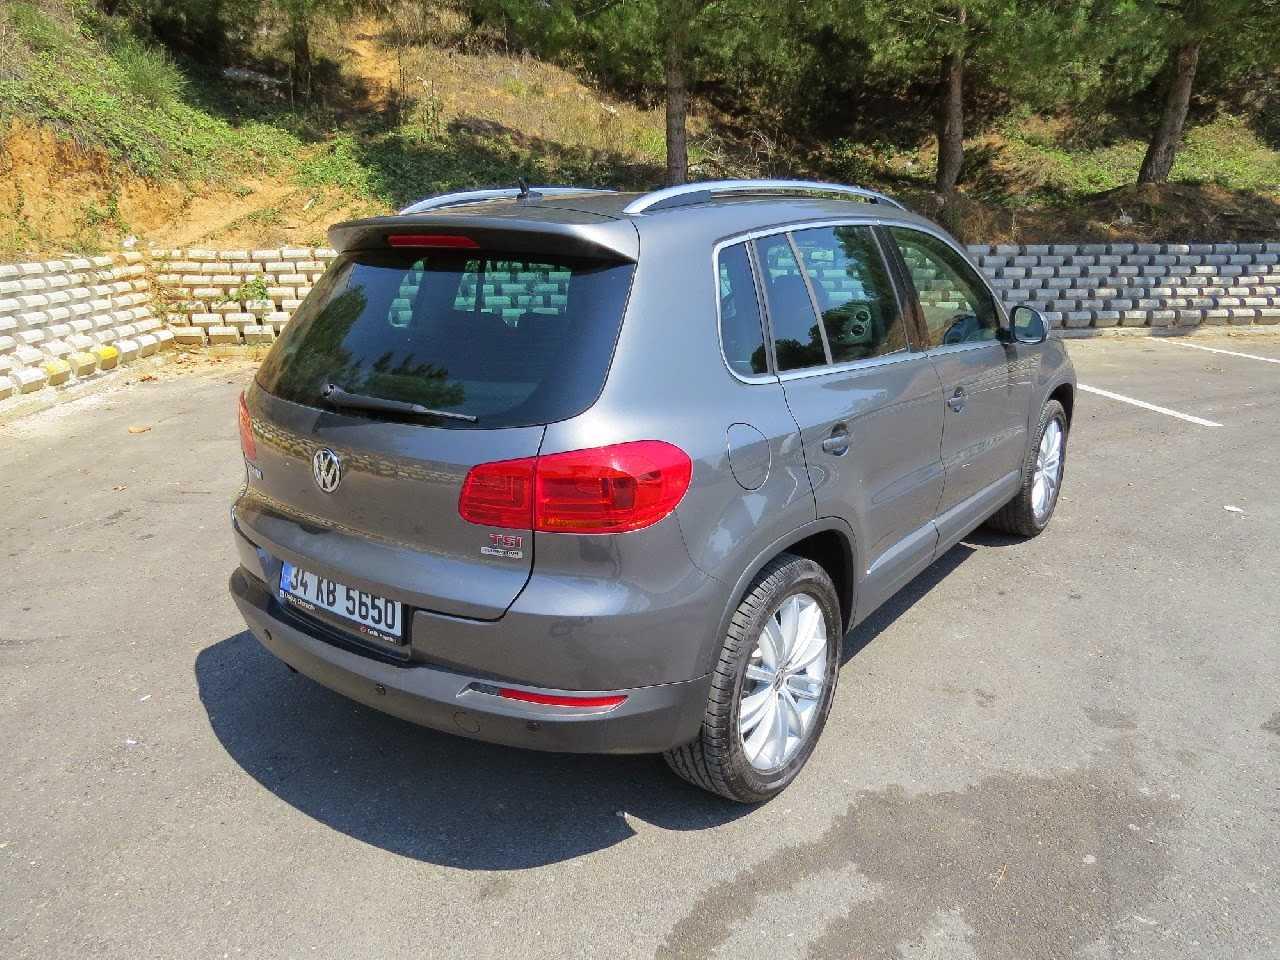 Volkswagen tiguan 1.4 tsi bluemotion dsg allstar (06.2016 - 03.2016) - технические характеристики